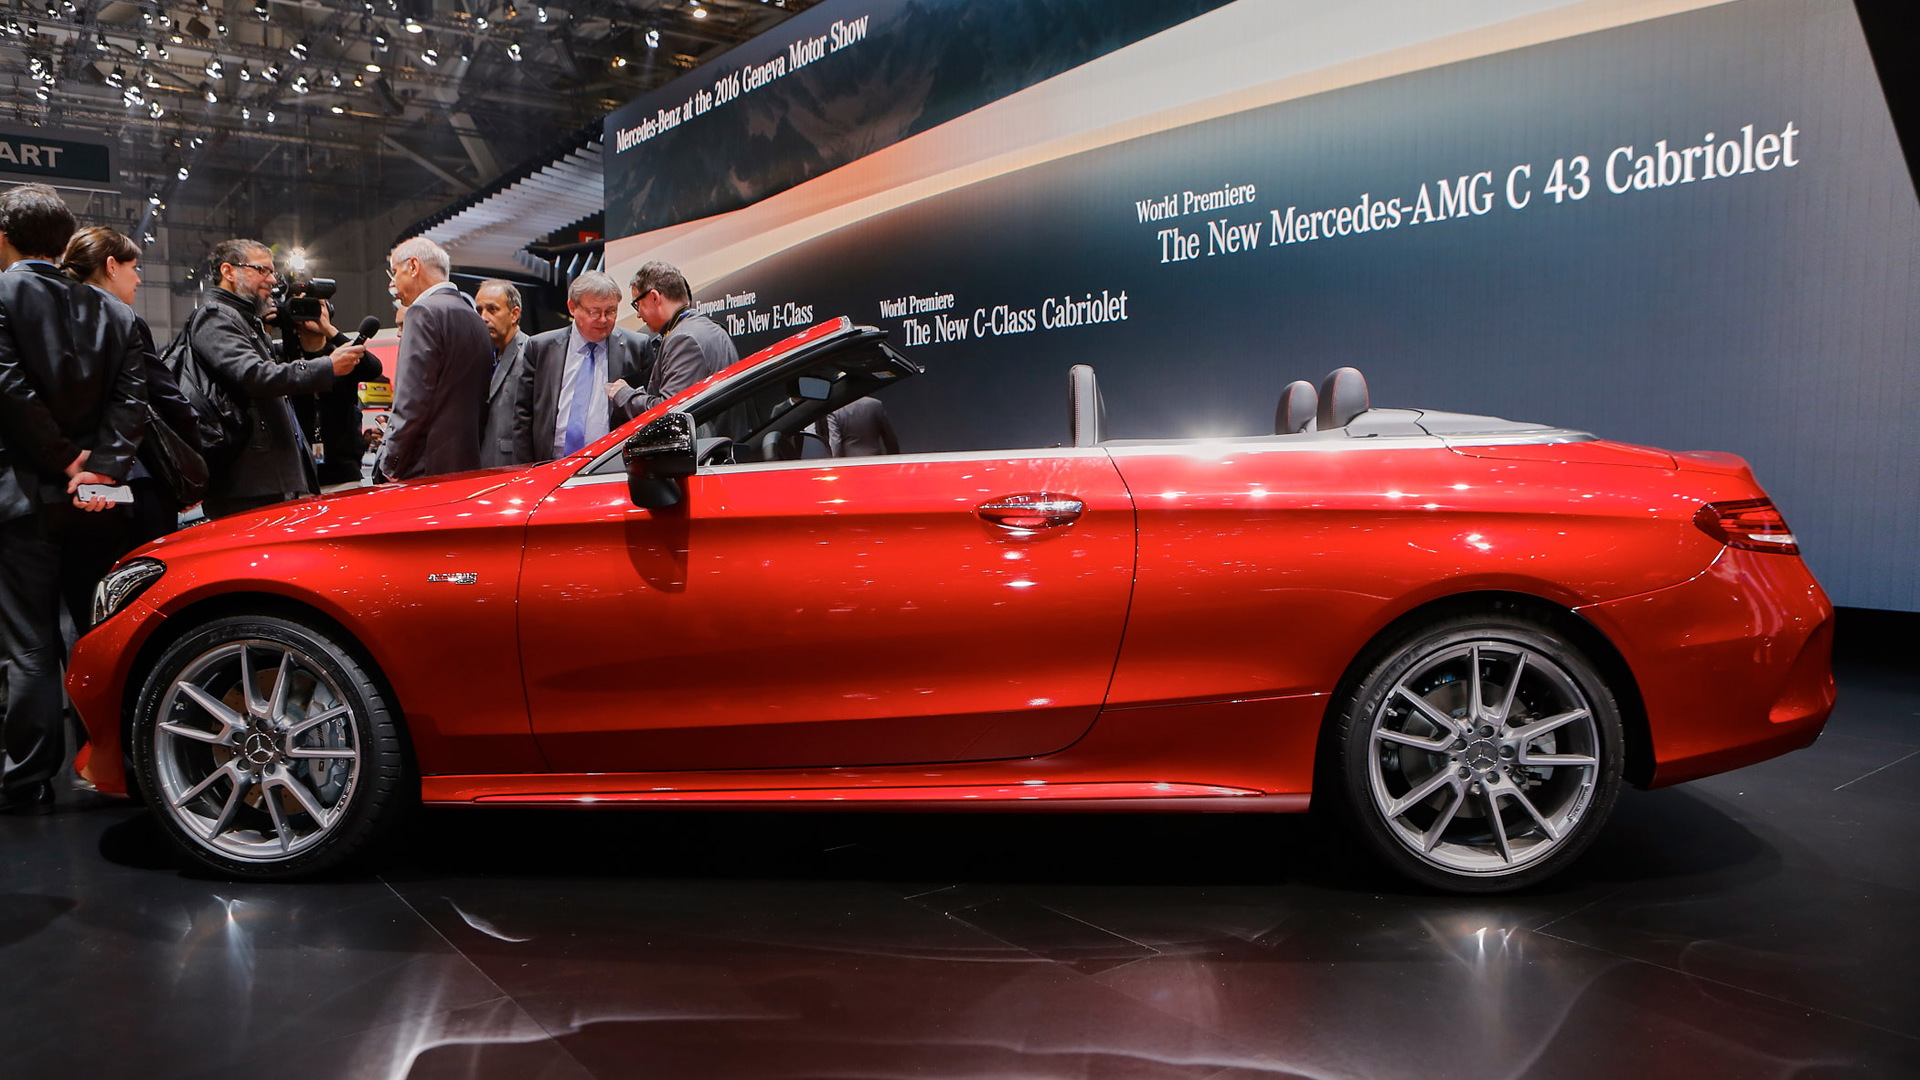 2017 Mercedes-AMG C43 Cabriolet, 2016 Geneva Motor Show